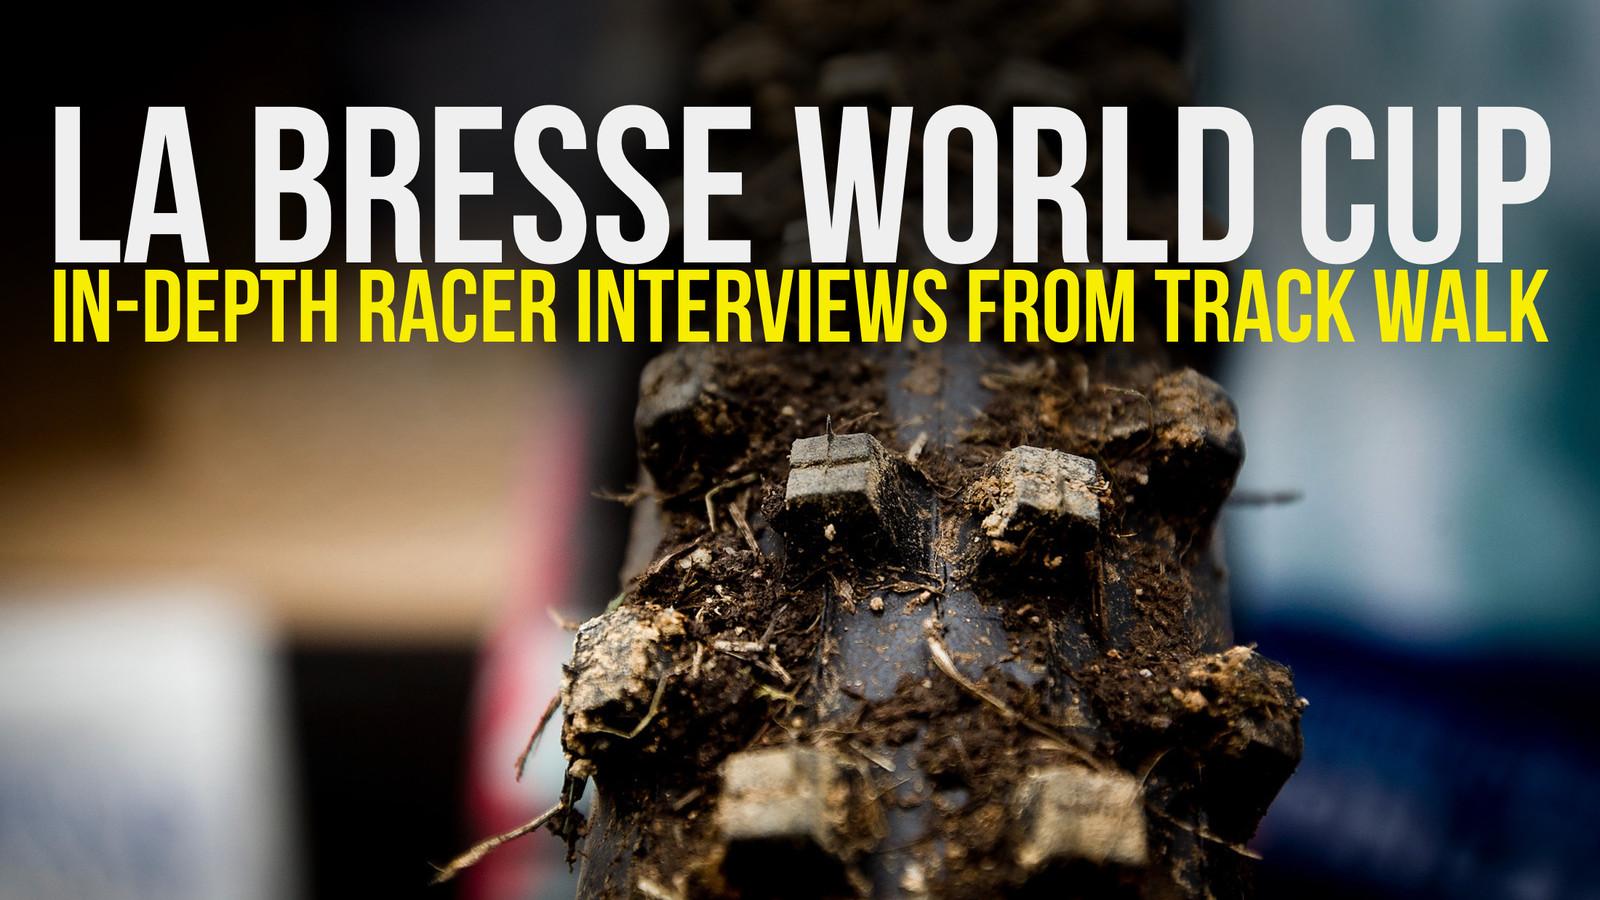 RACER INTERVIEWS - La Bresse World Cup DH Track Walk